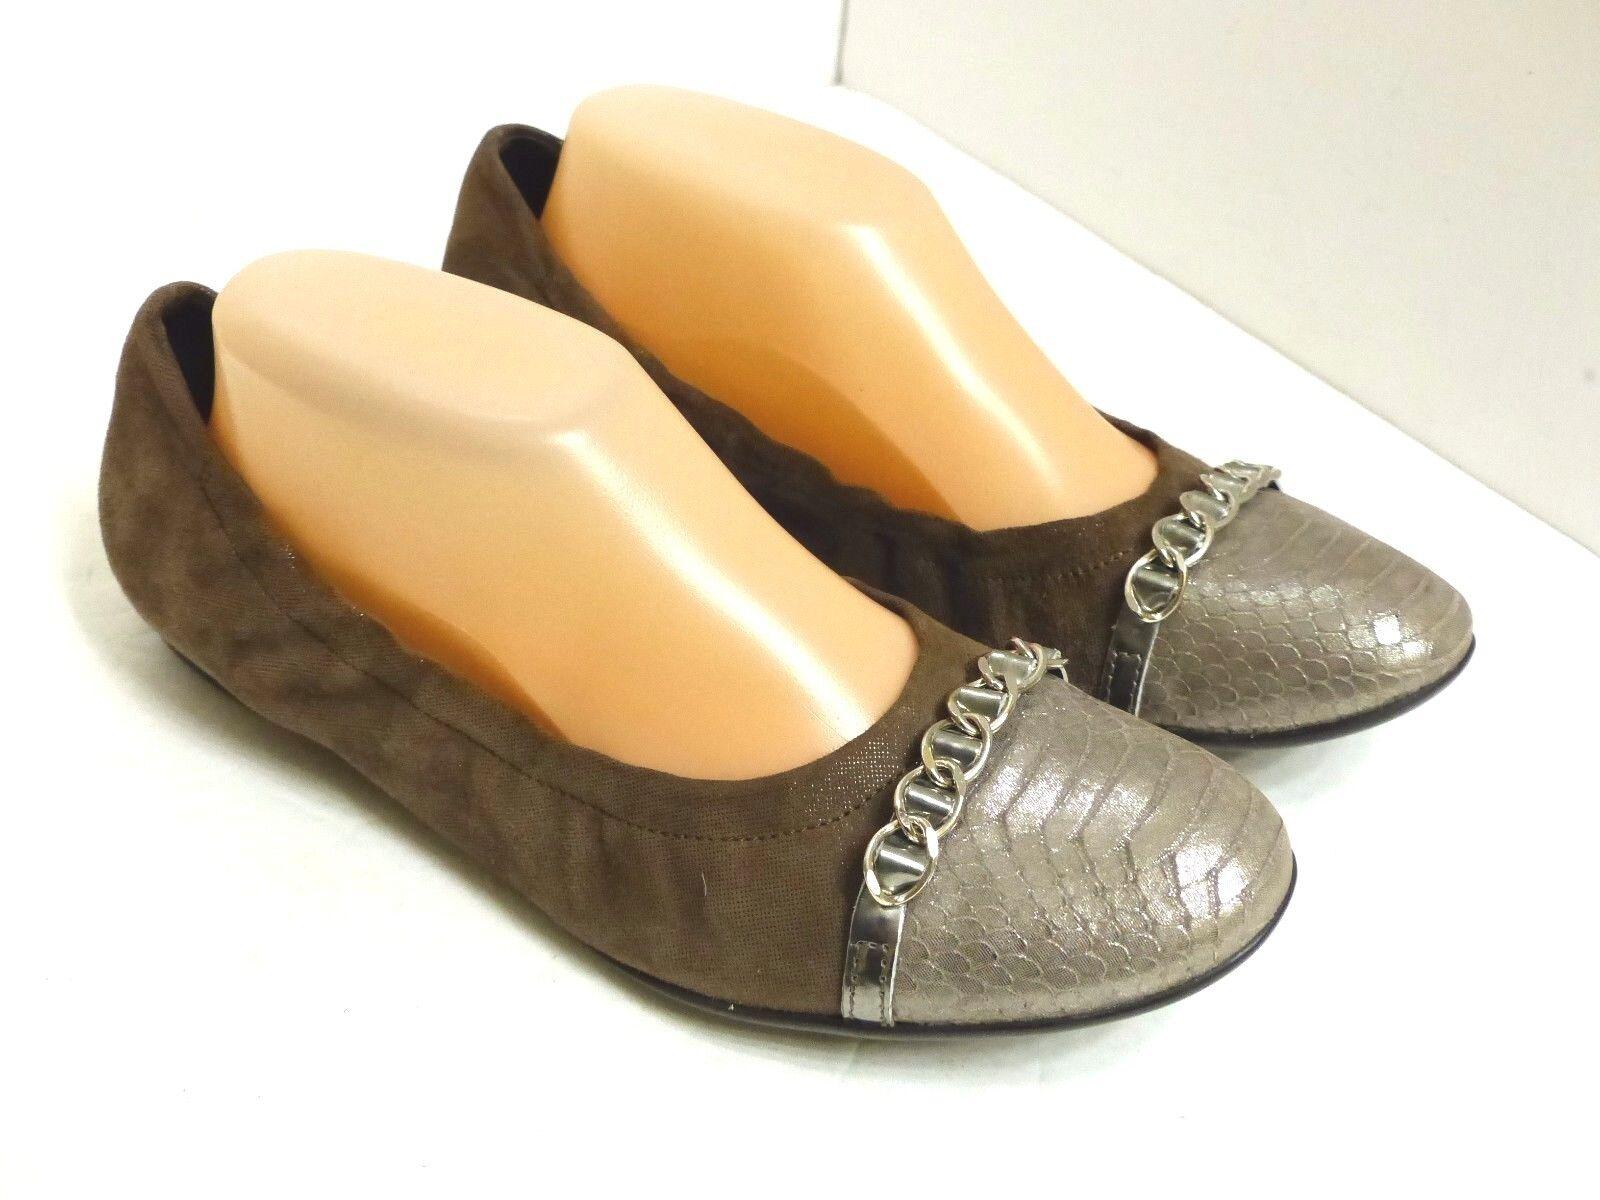 EUC AGL Women's /2 US 10 Light Taupe Silver Reptile Reptile Silver Cap Toe Ballet Flats 172ece